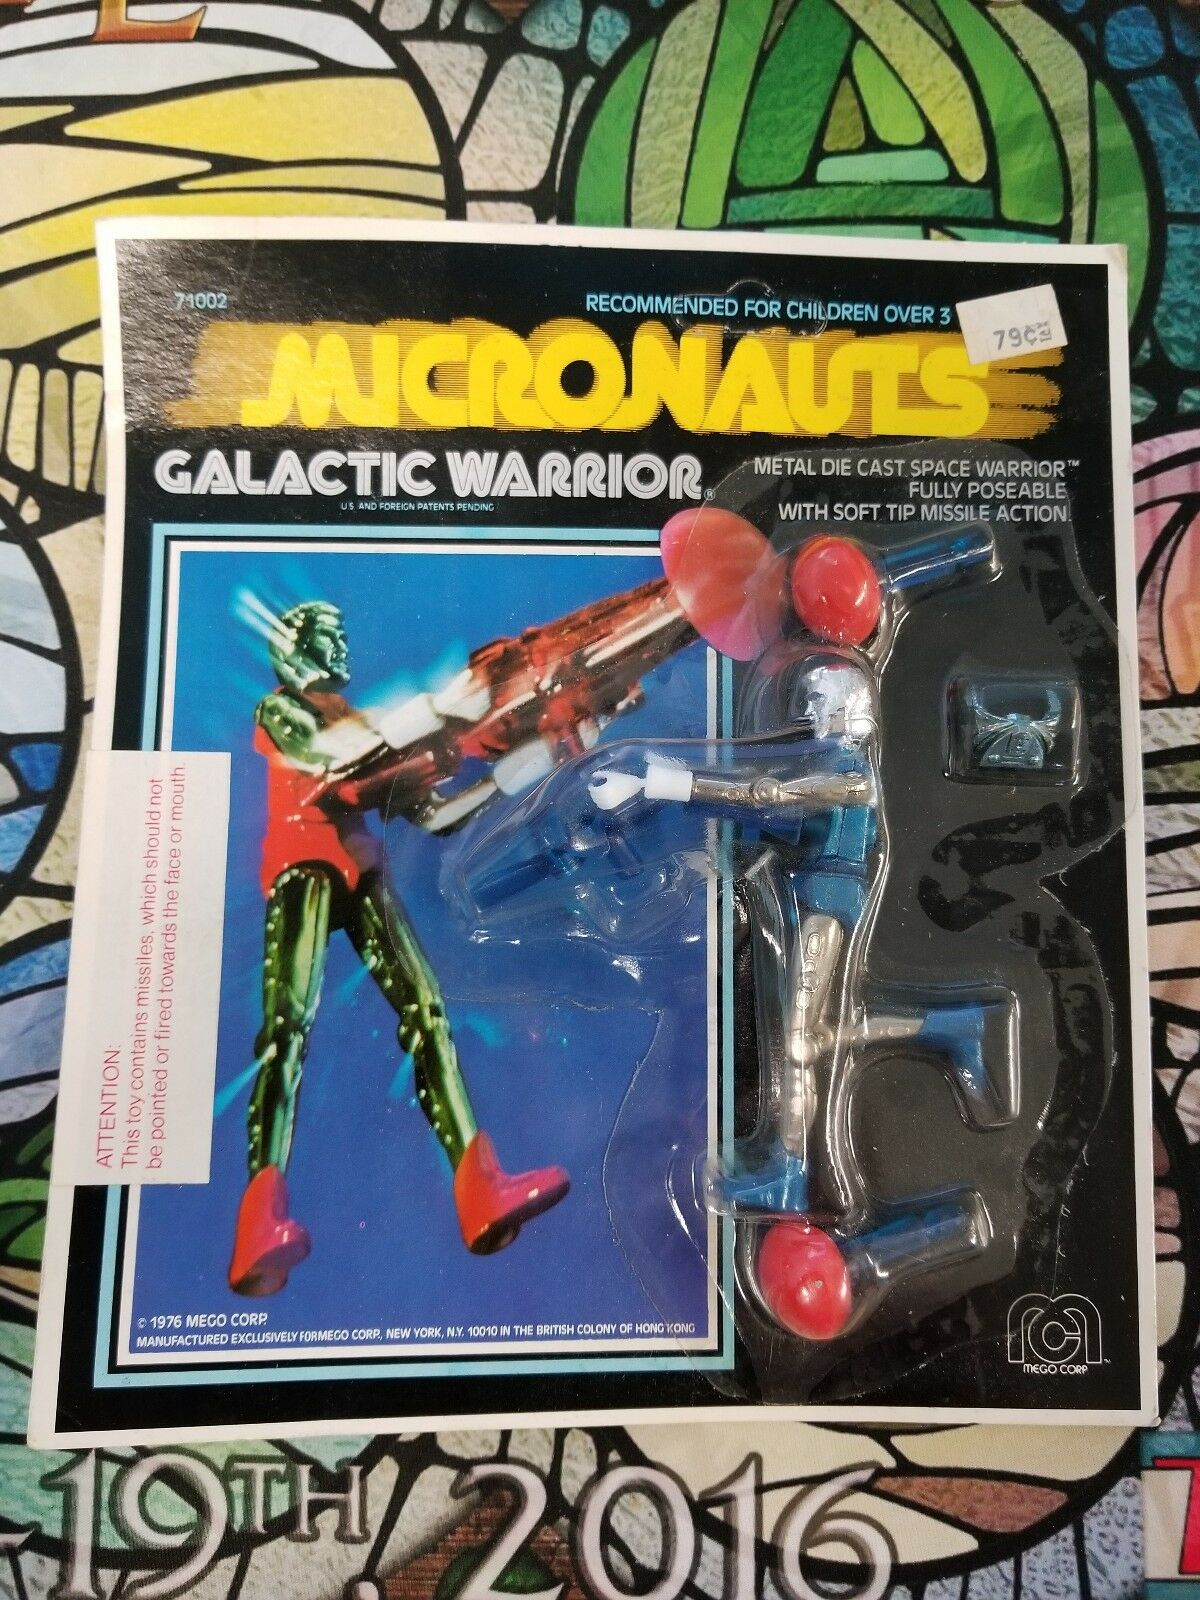 Micronauts Galactic Warrior Blau Mego Corp. 1976 3.75-in MOC Unpunched SAAH07